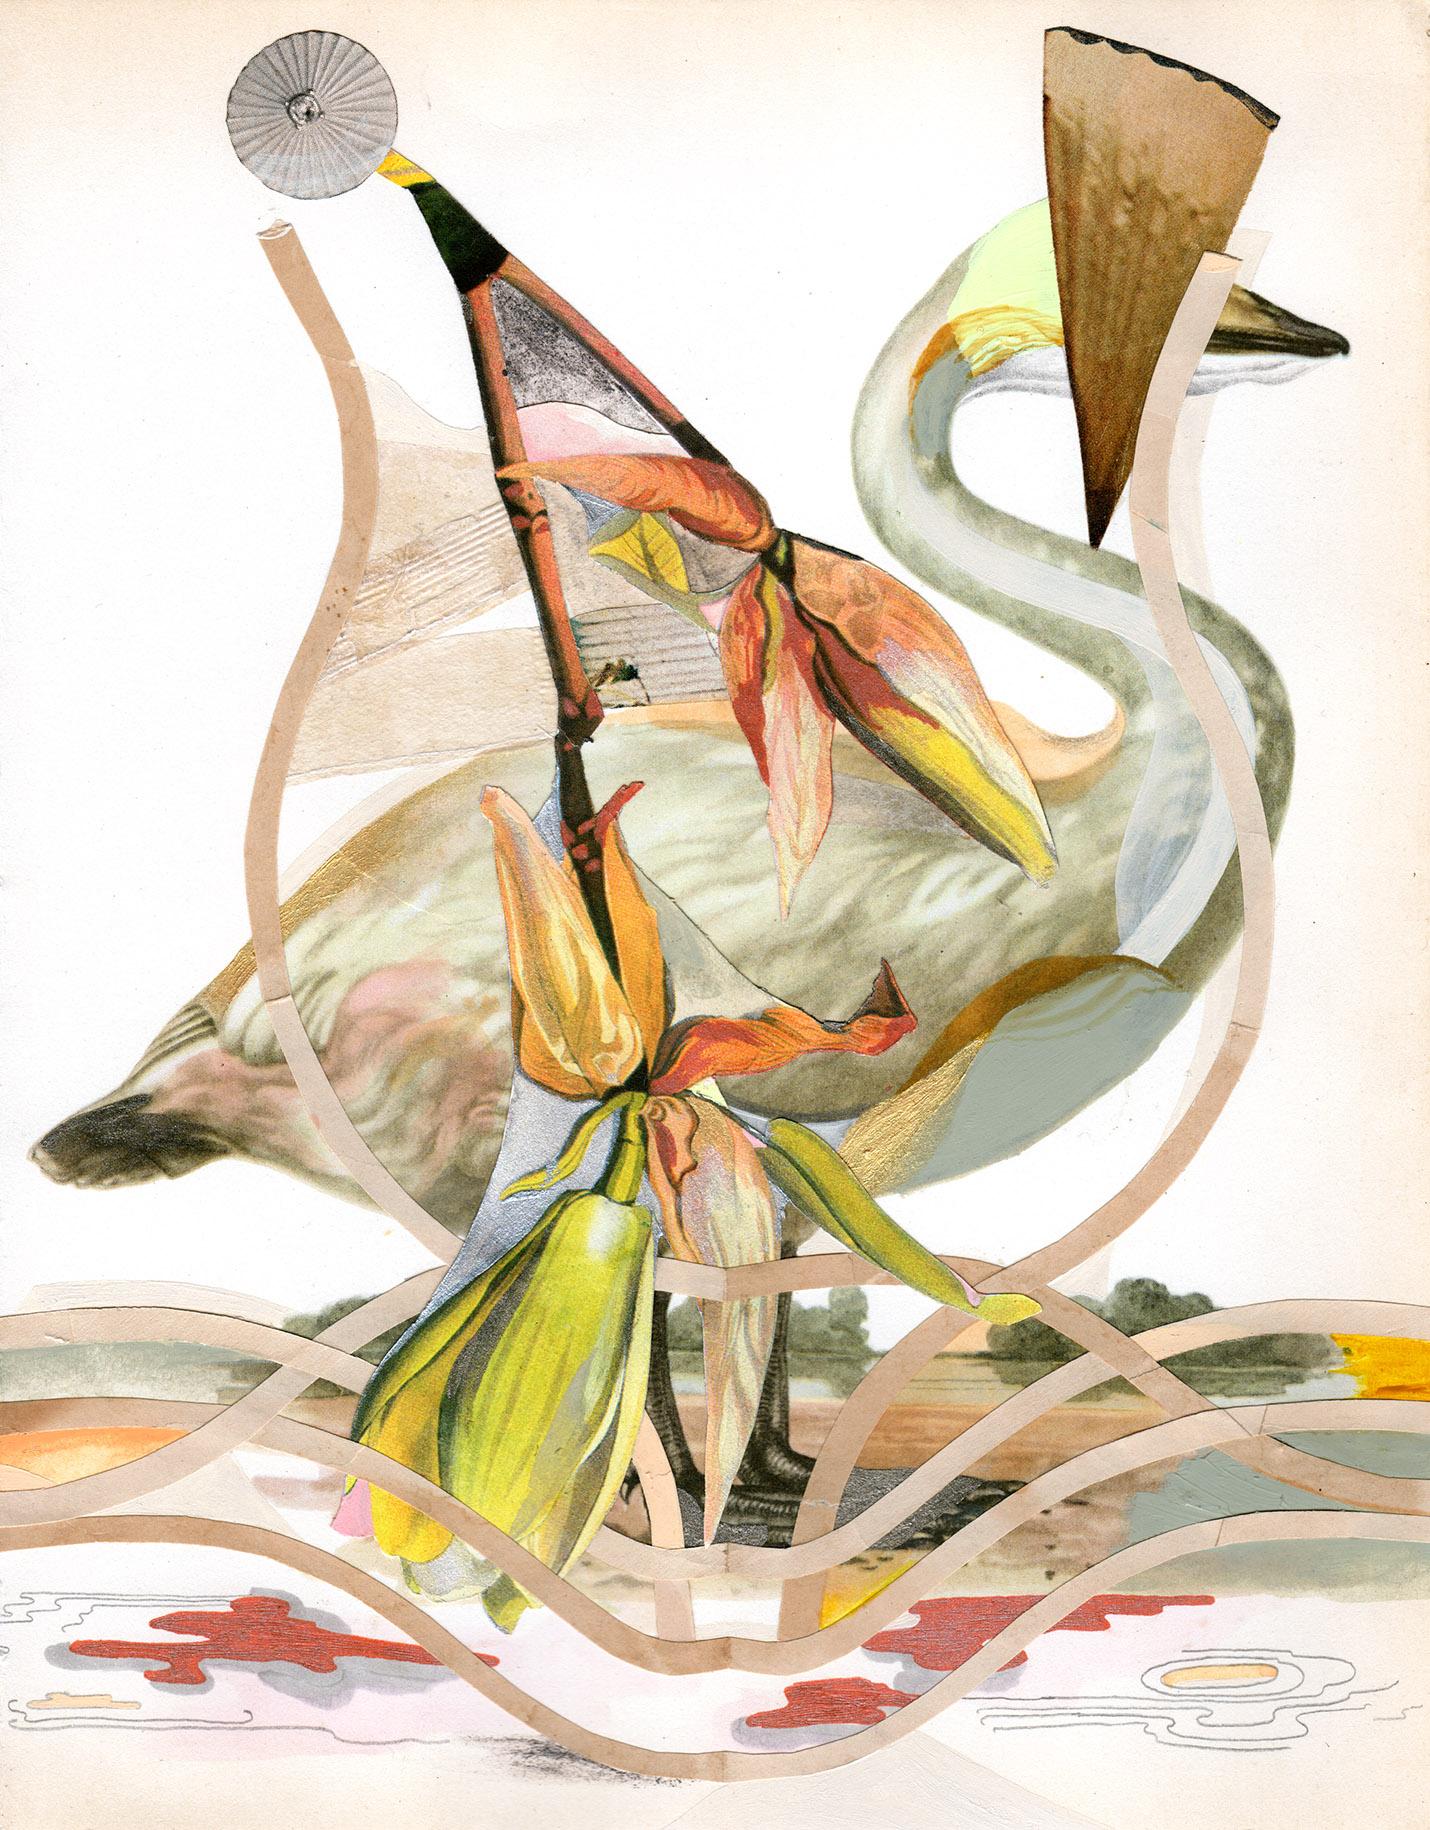 The whooper swan